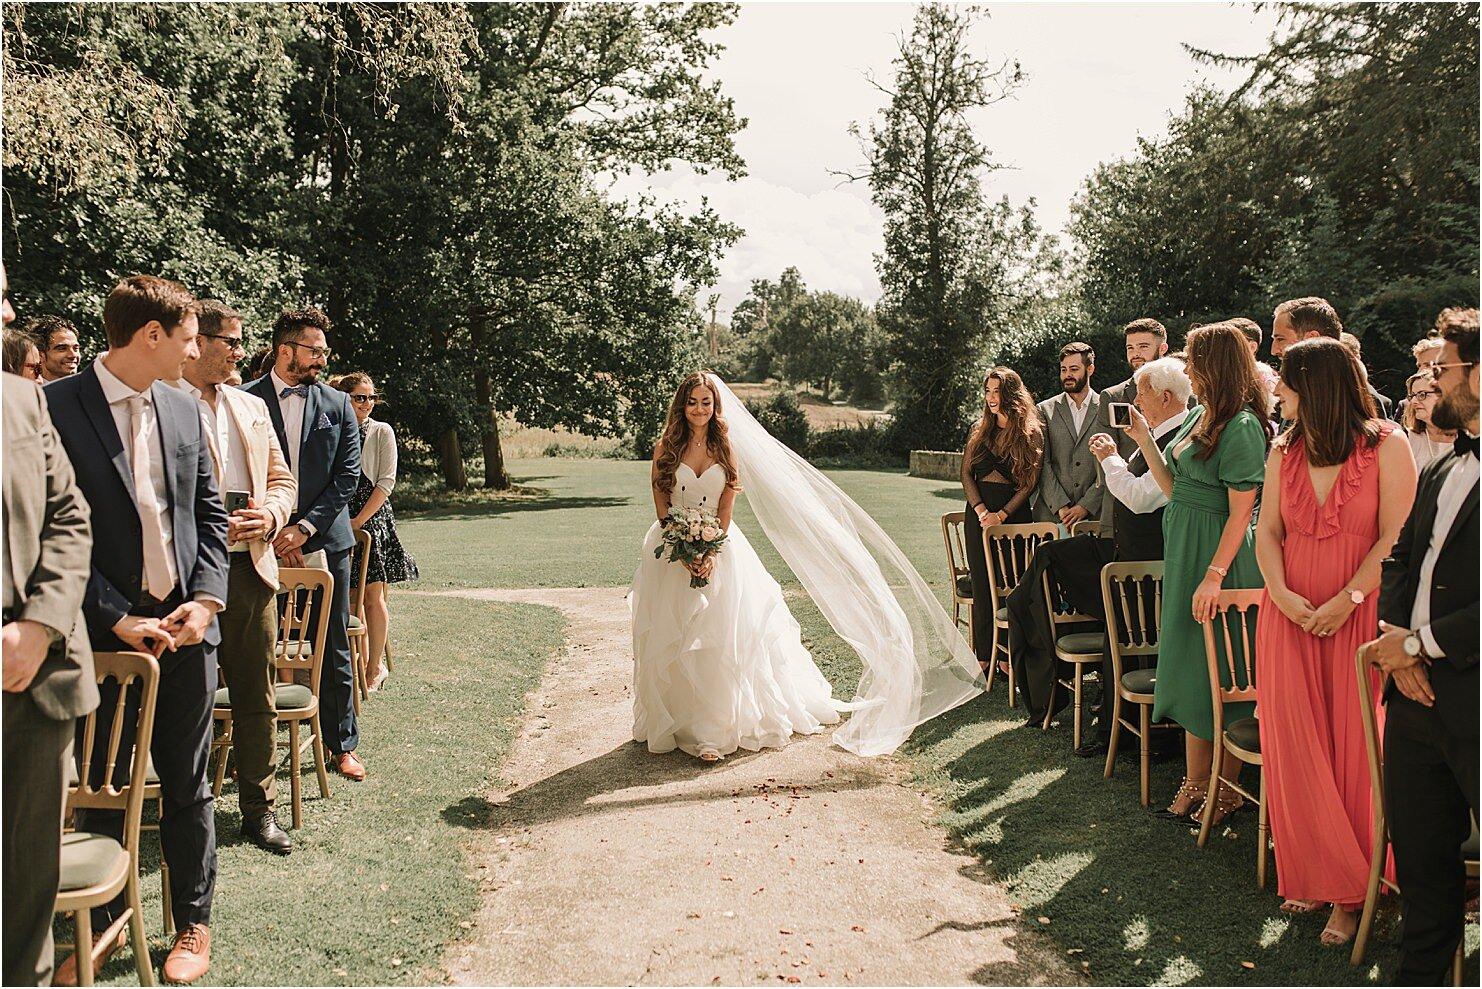 boda-de-cuento-en-castillo-boda-en-londres-48.jpg